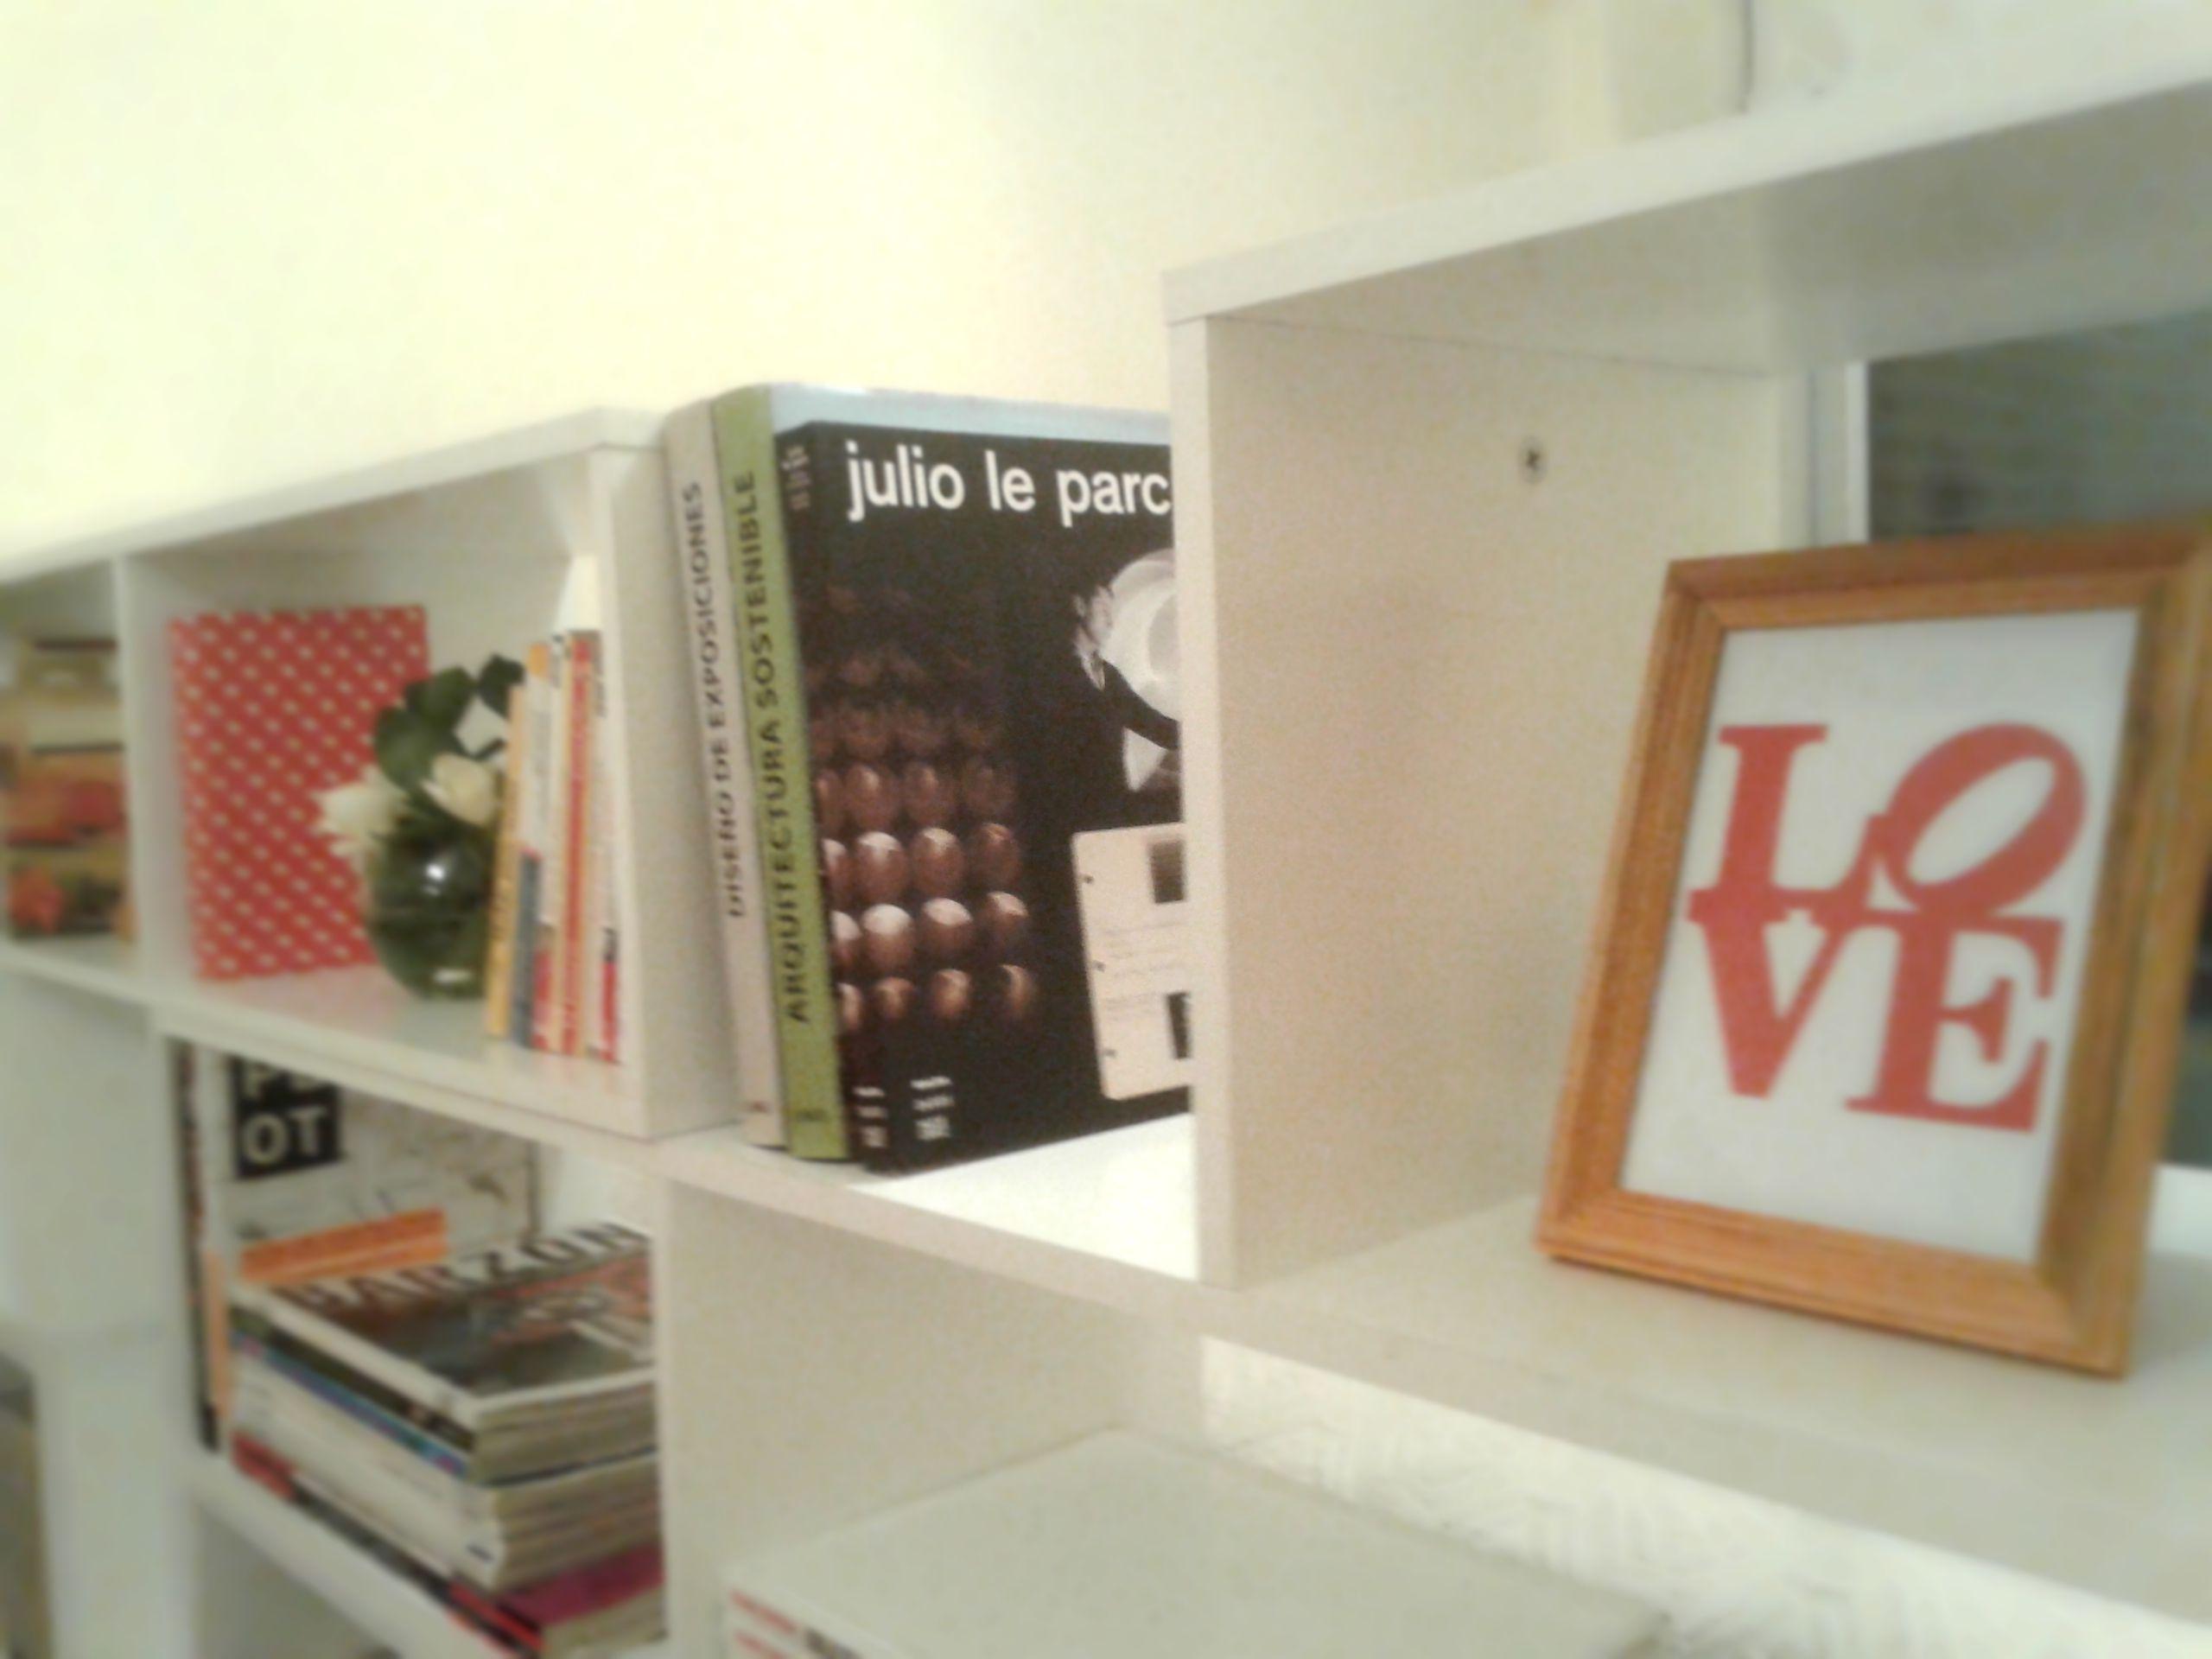 Mueble Divisor Monoambiente Monolove Pinterest # Muebles Separadores Para Monoambientes